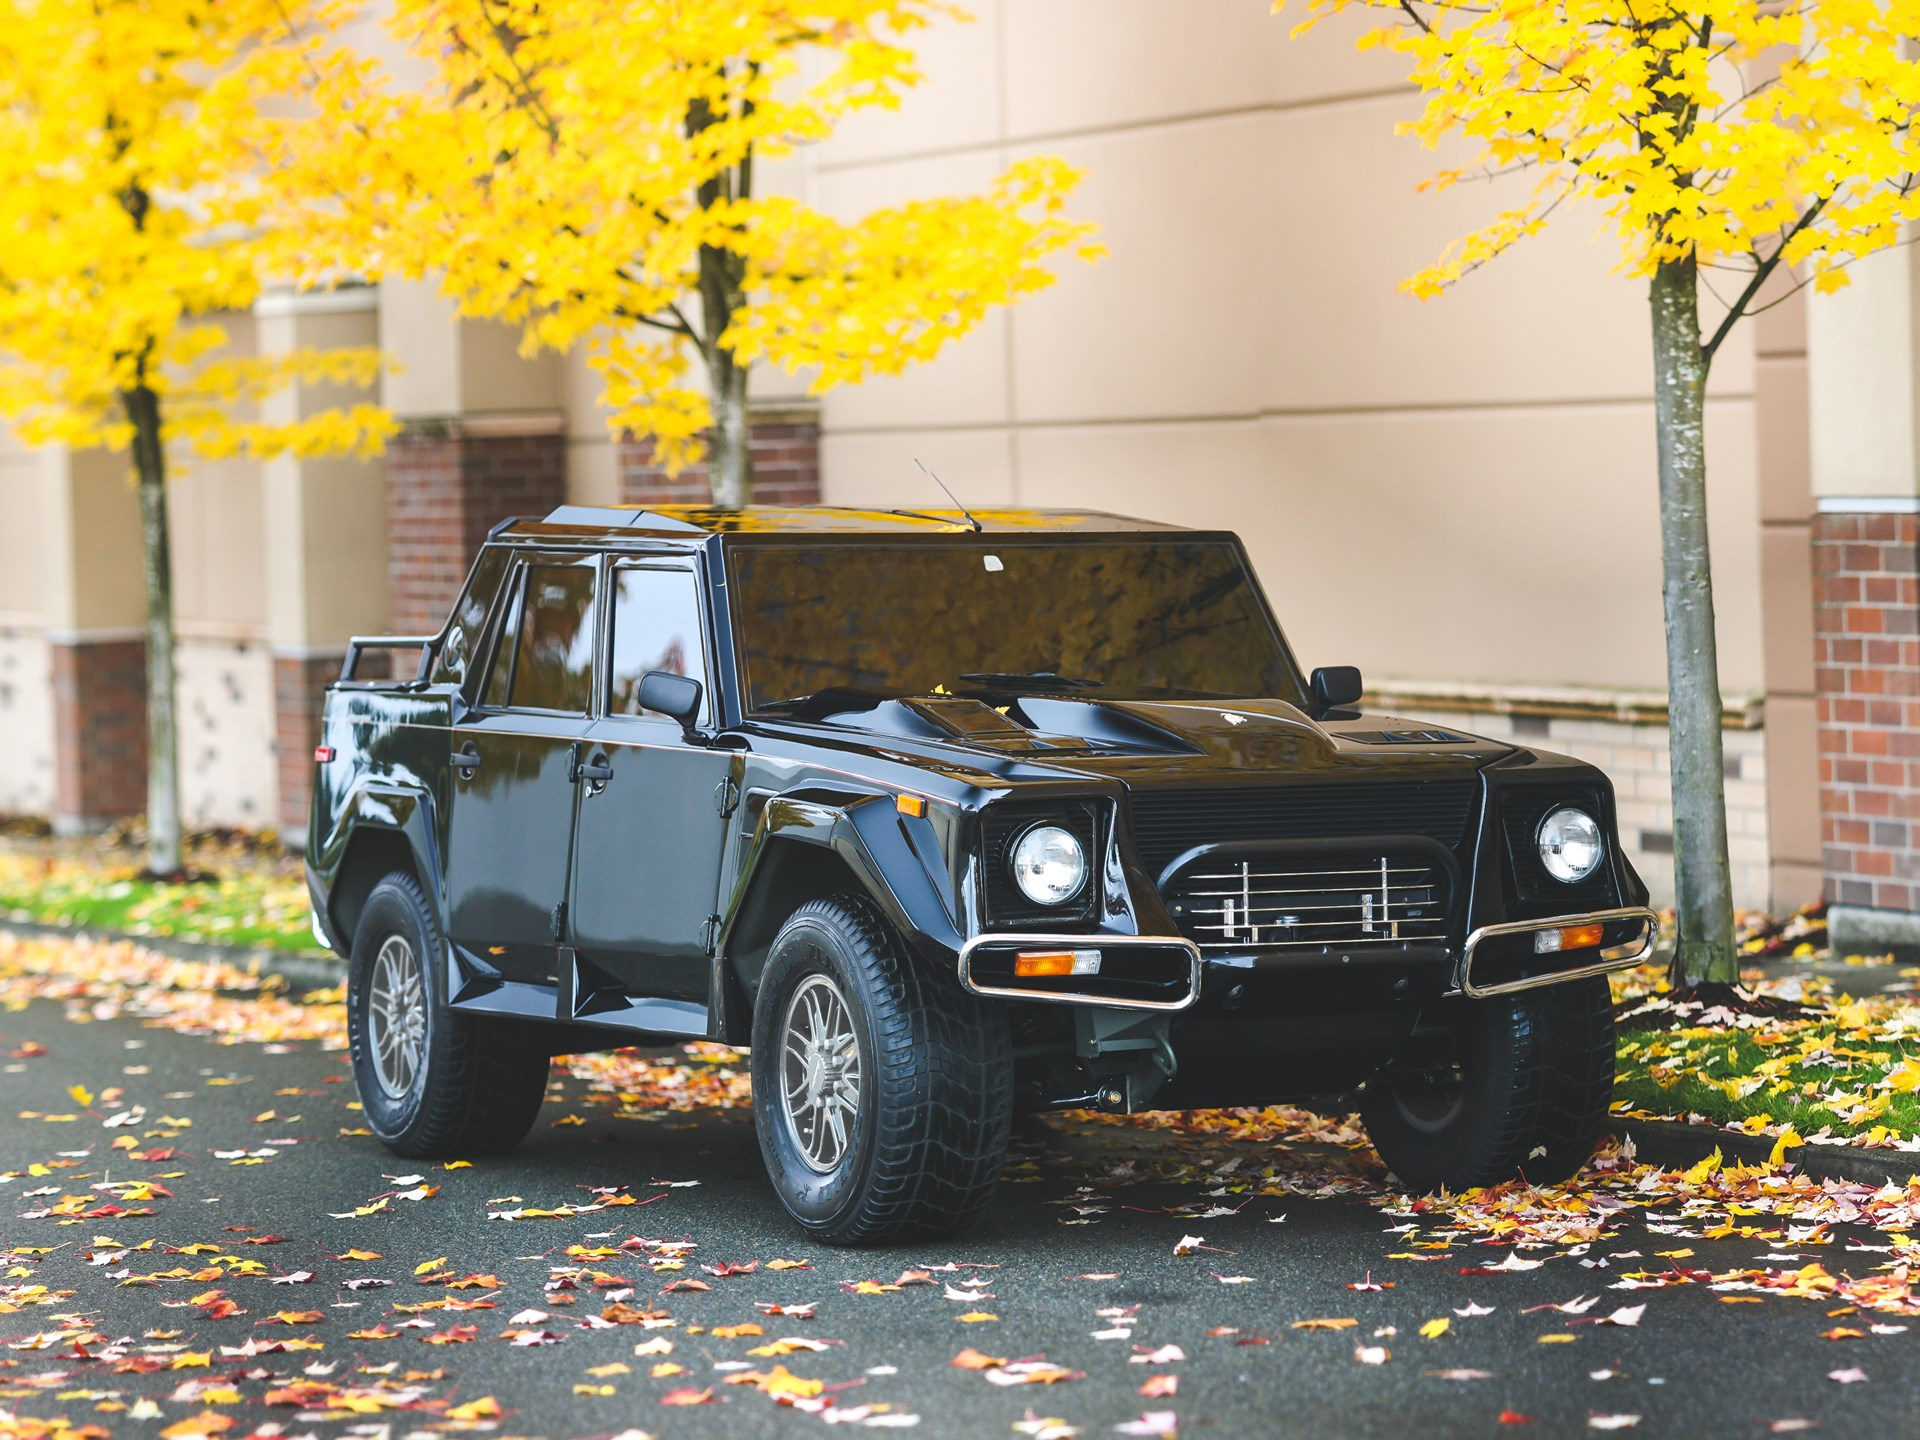 lamborghini countach for cars anniversario anniversa sale classifieds hemmings of